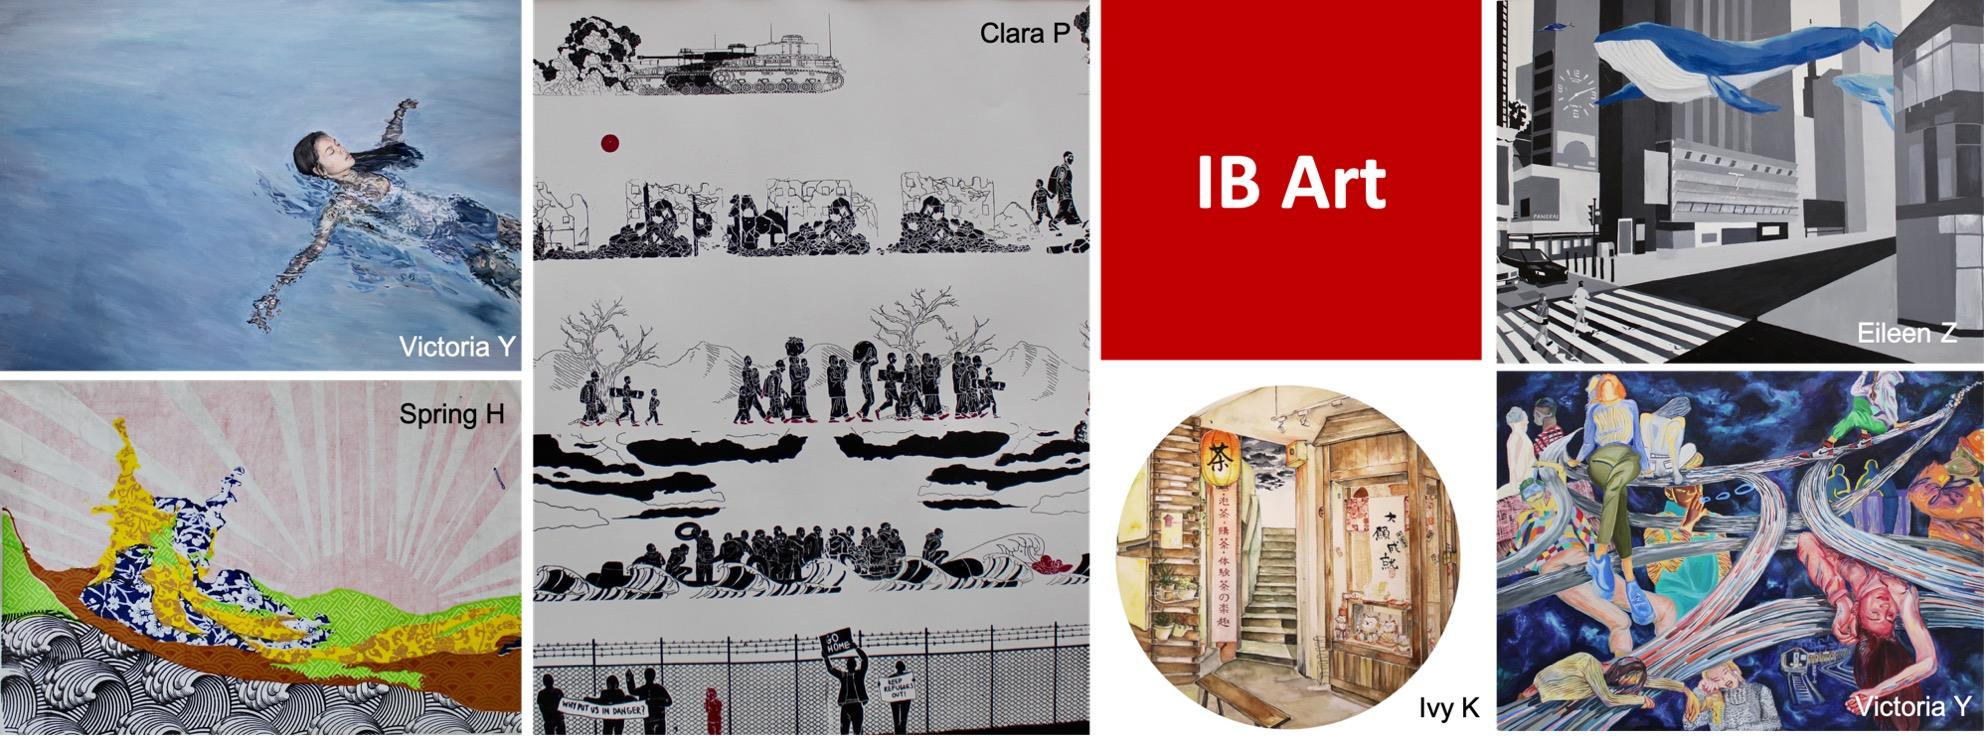 IB 艺术